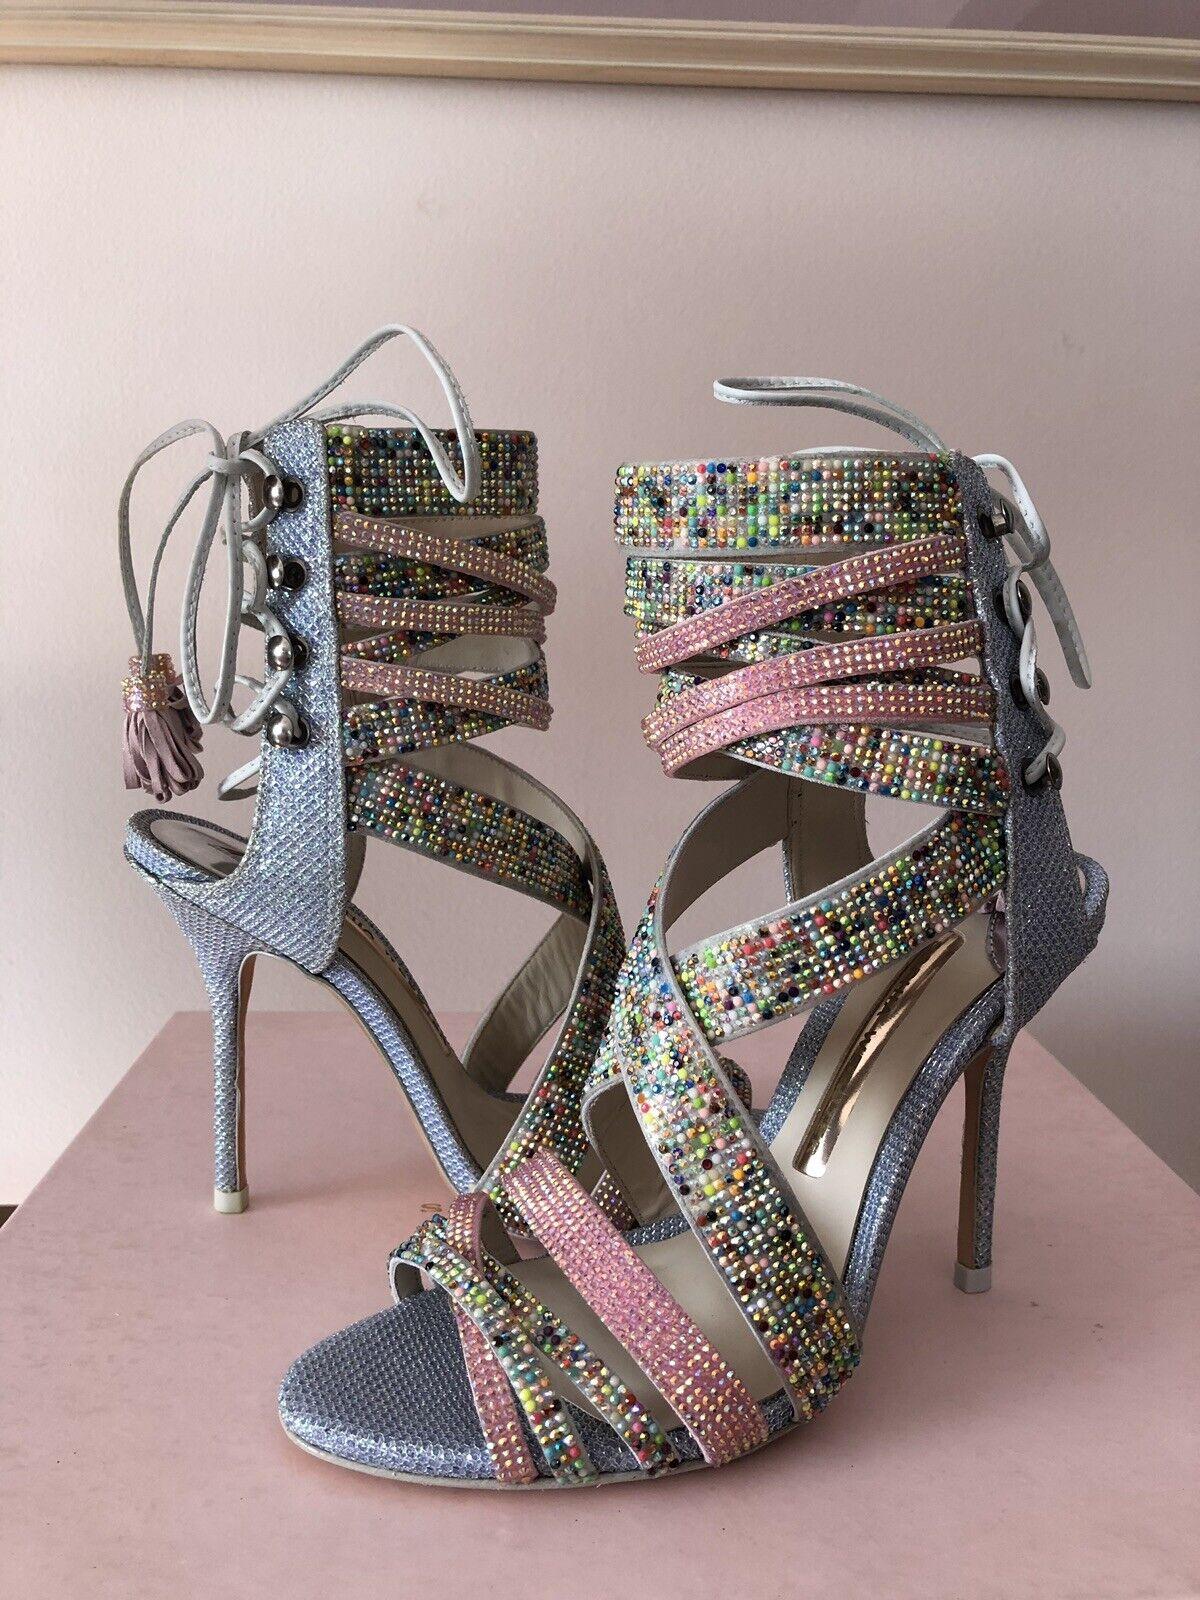 Sophia Webster Adeline Dreamy Crystal Pink bluee Sandal High Bootie SzUS6.5 36.5